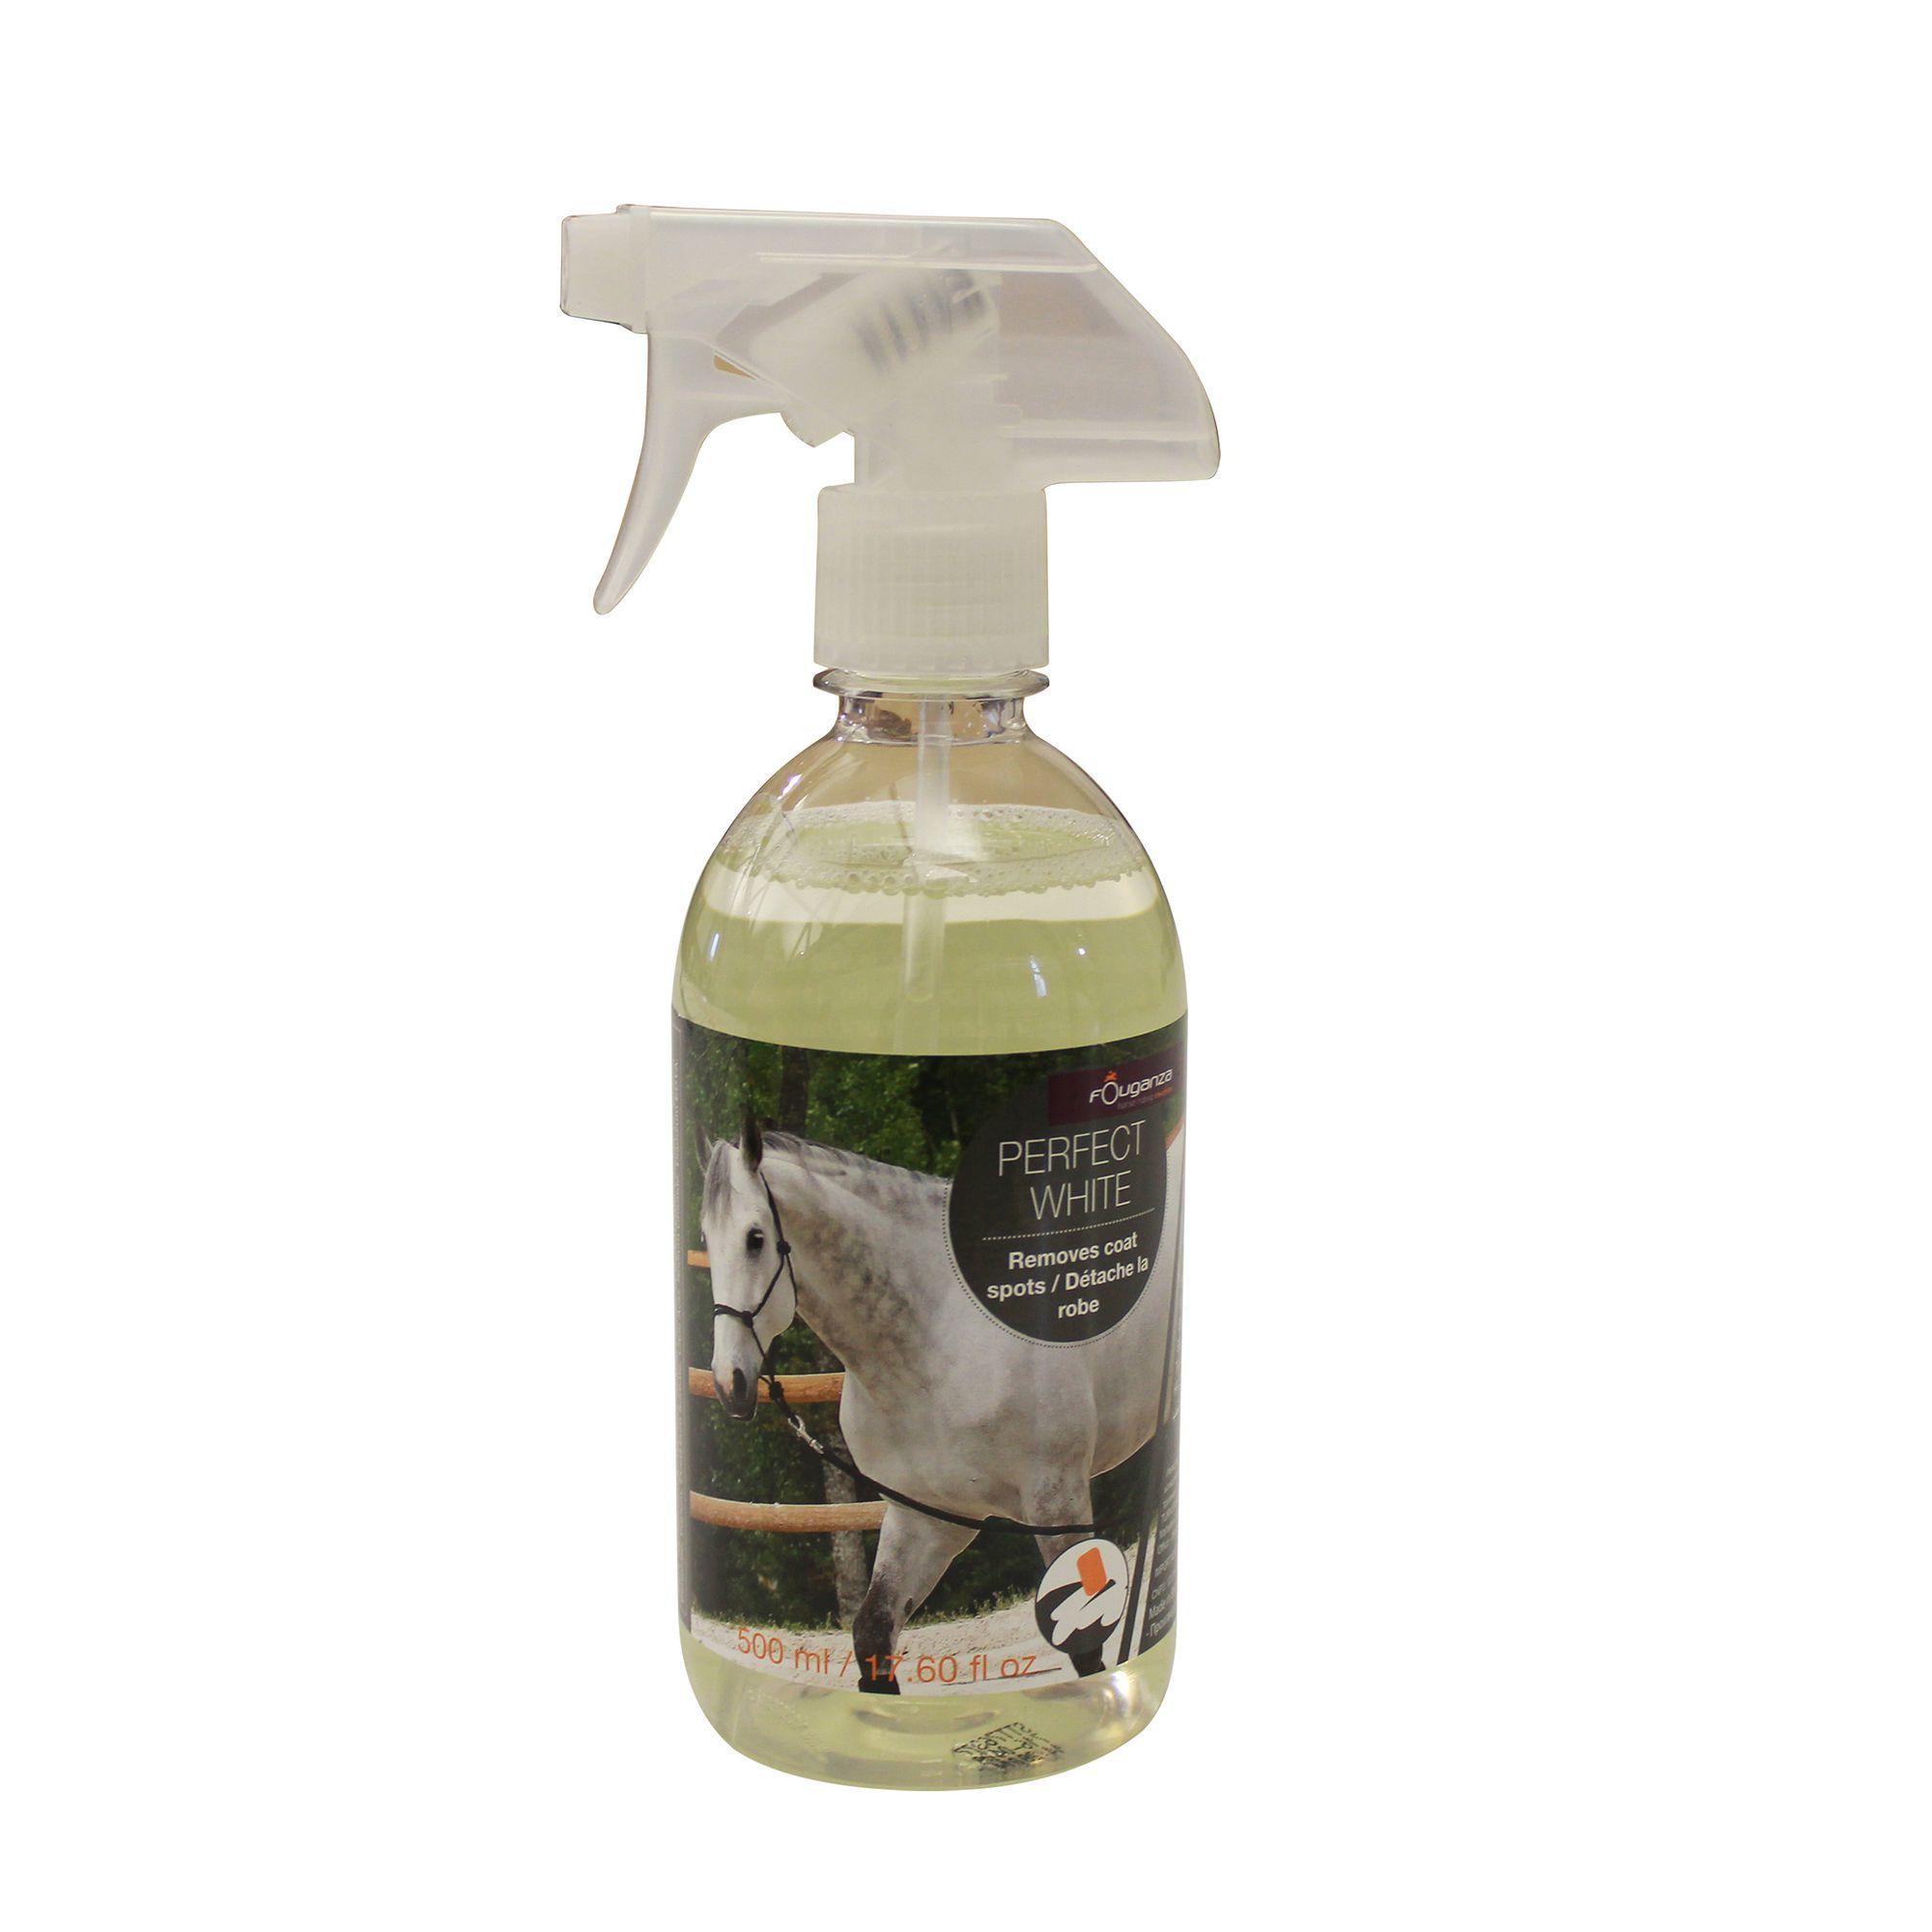 Fouganza Ontvlekkerspray ruitersport paarden en pony's Perfect White 500 ml